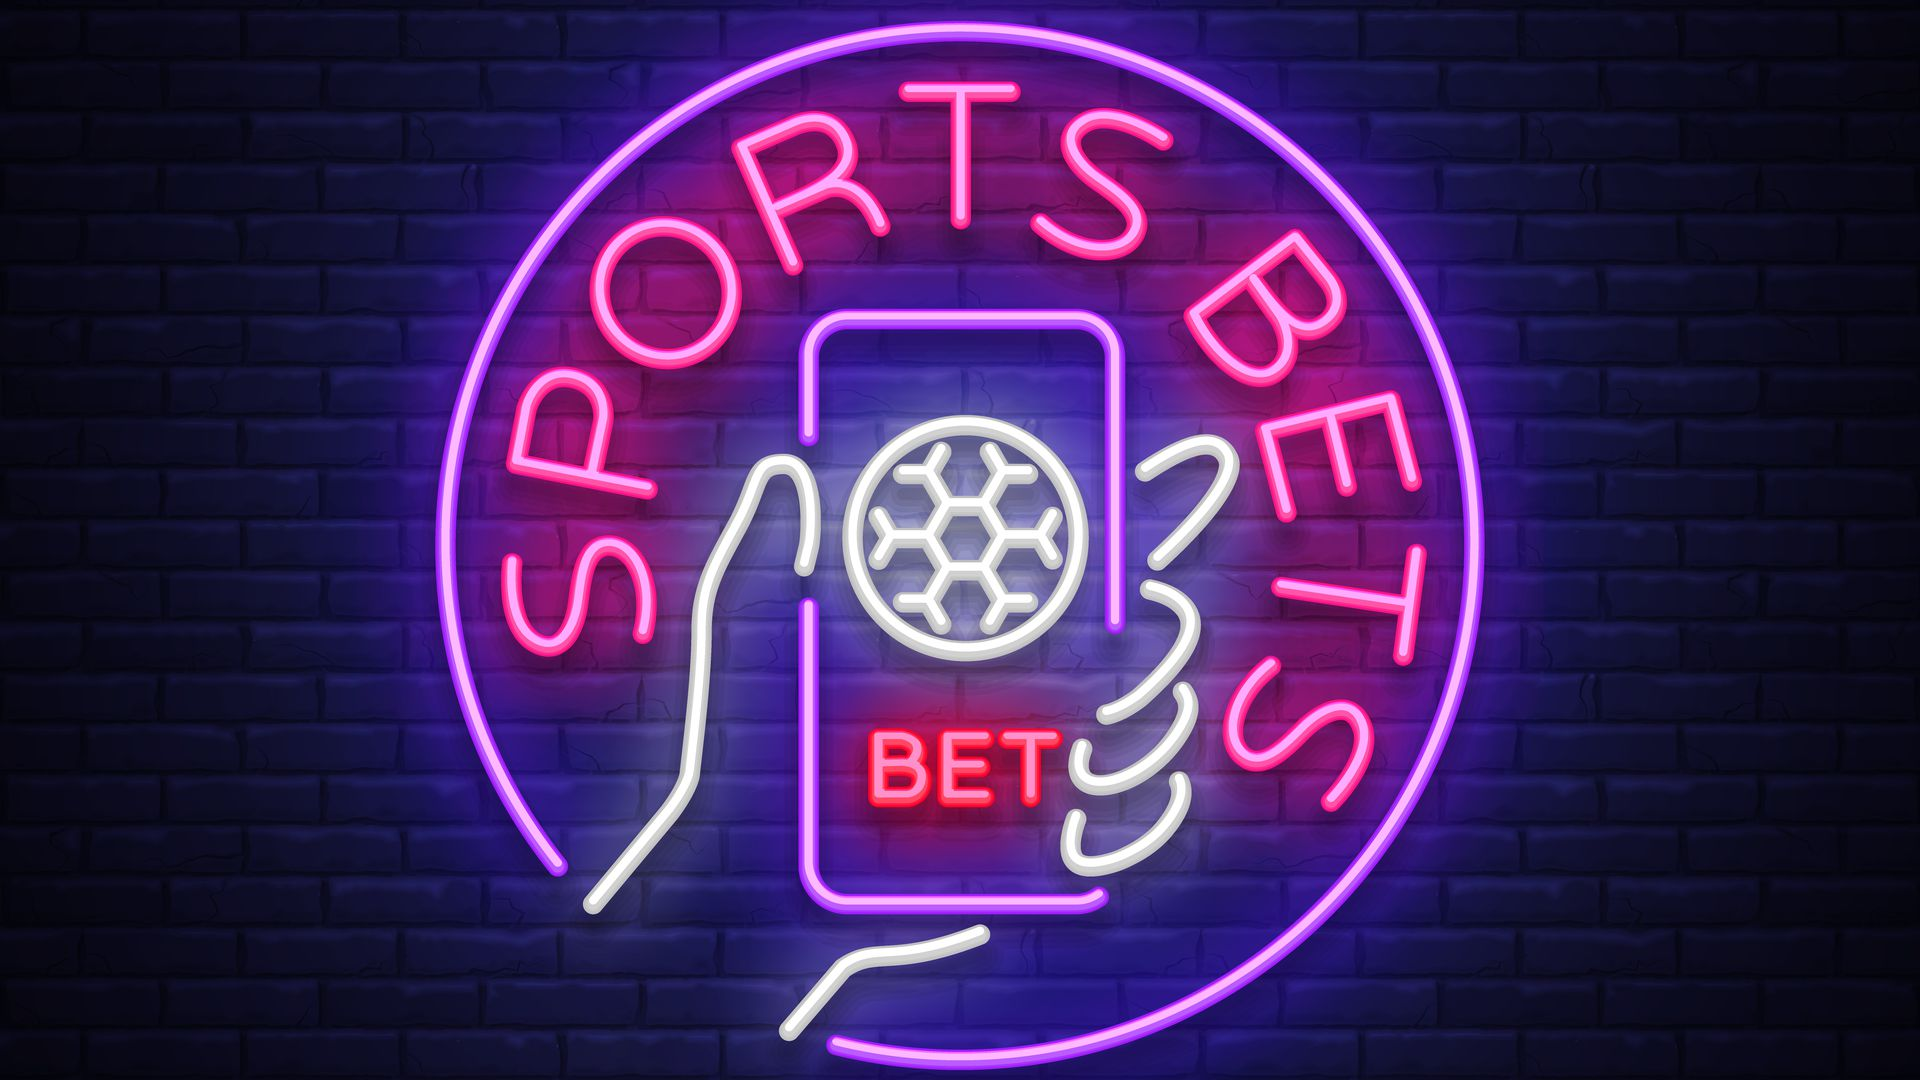 Montana betting sports spread betting companies uk yahoo